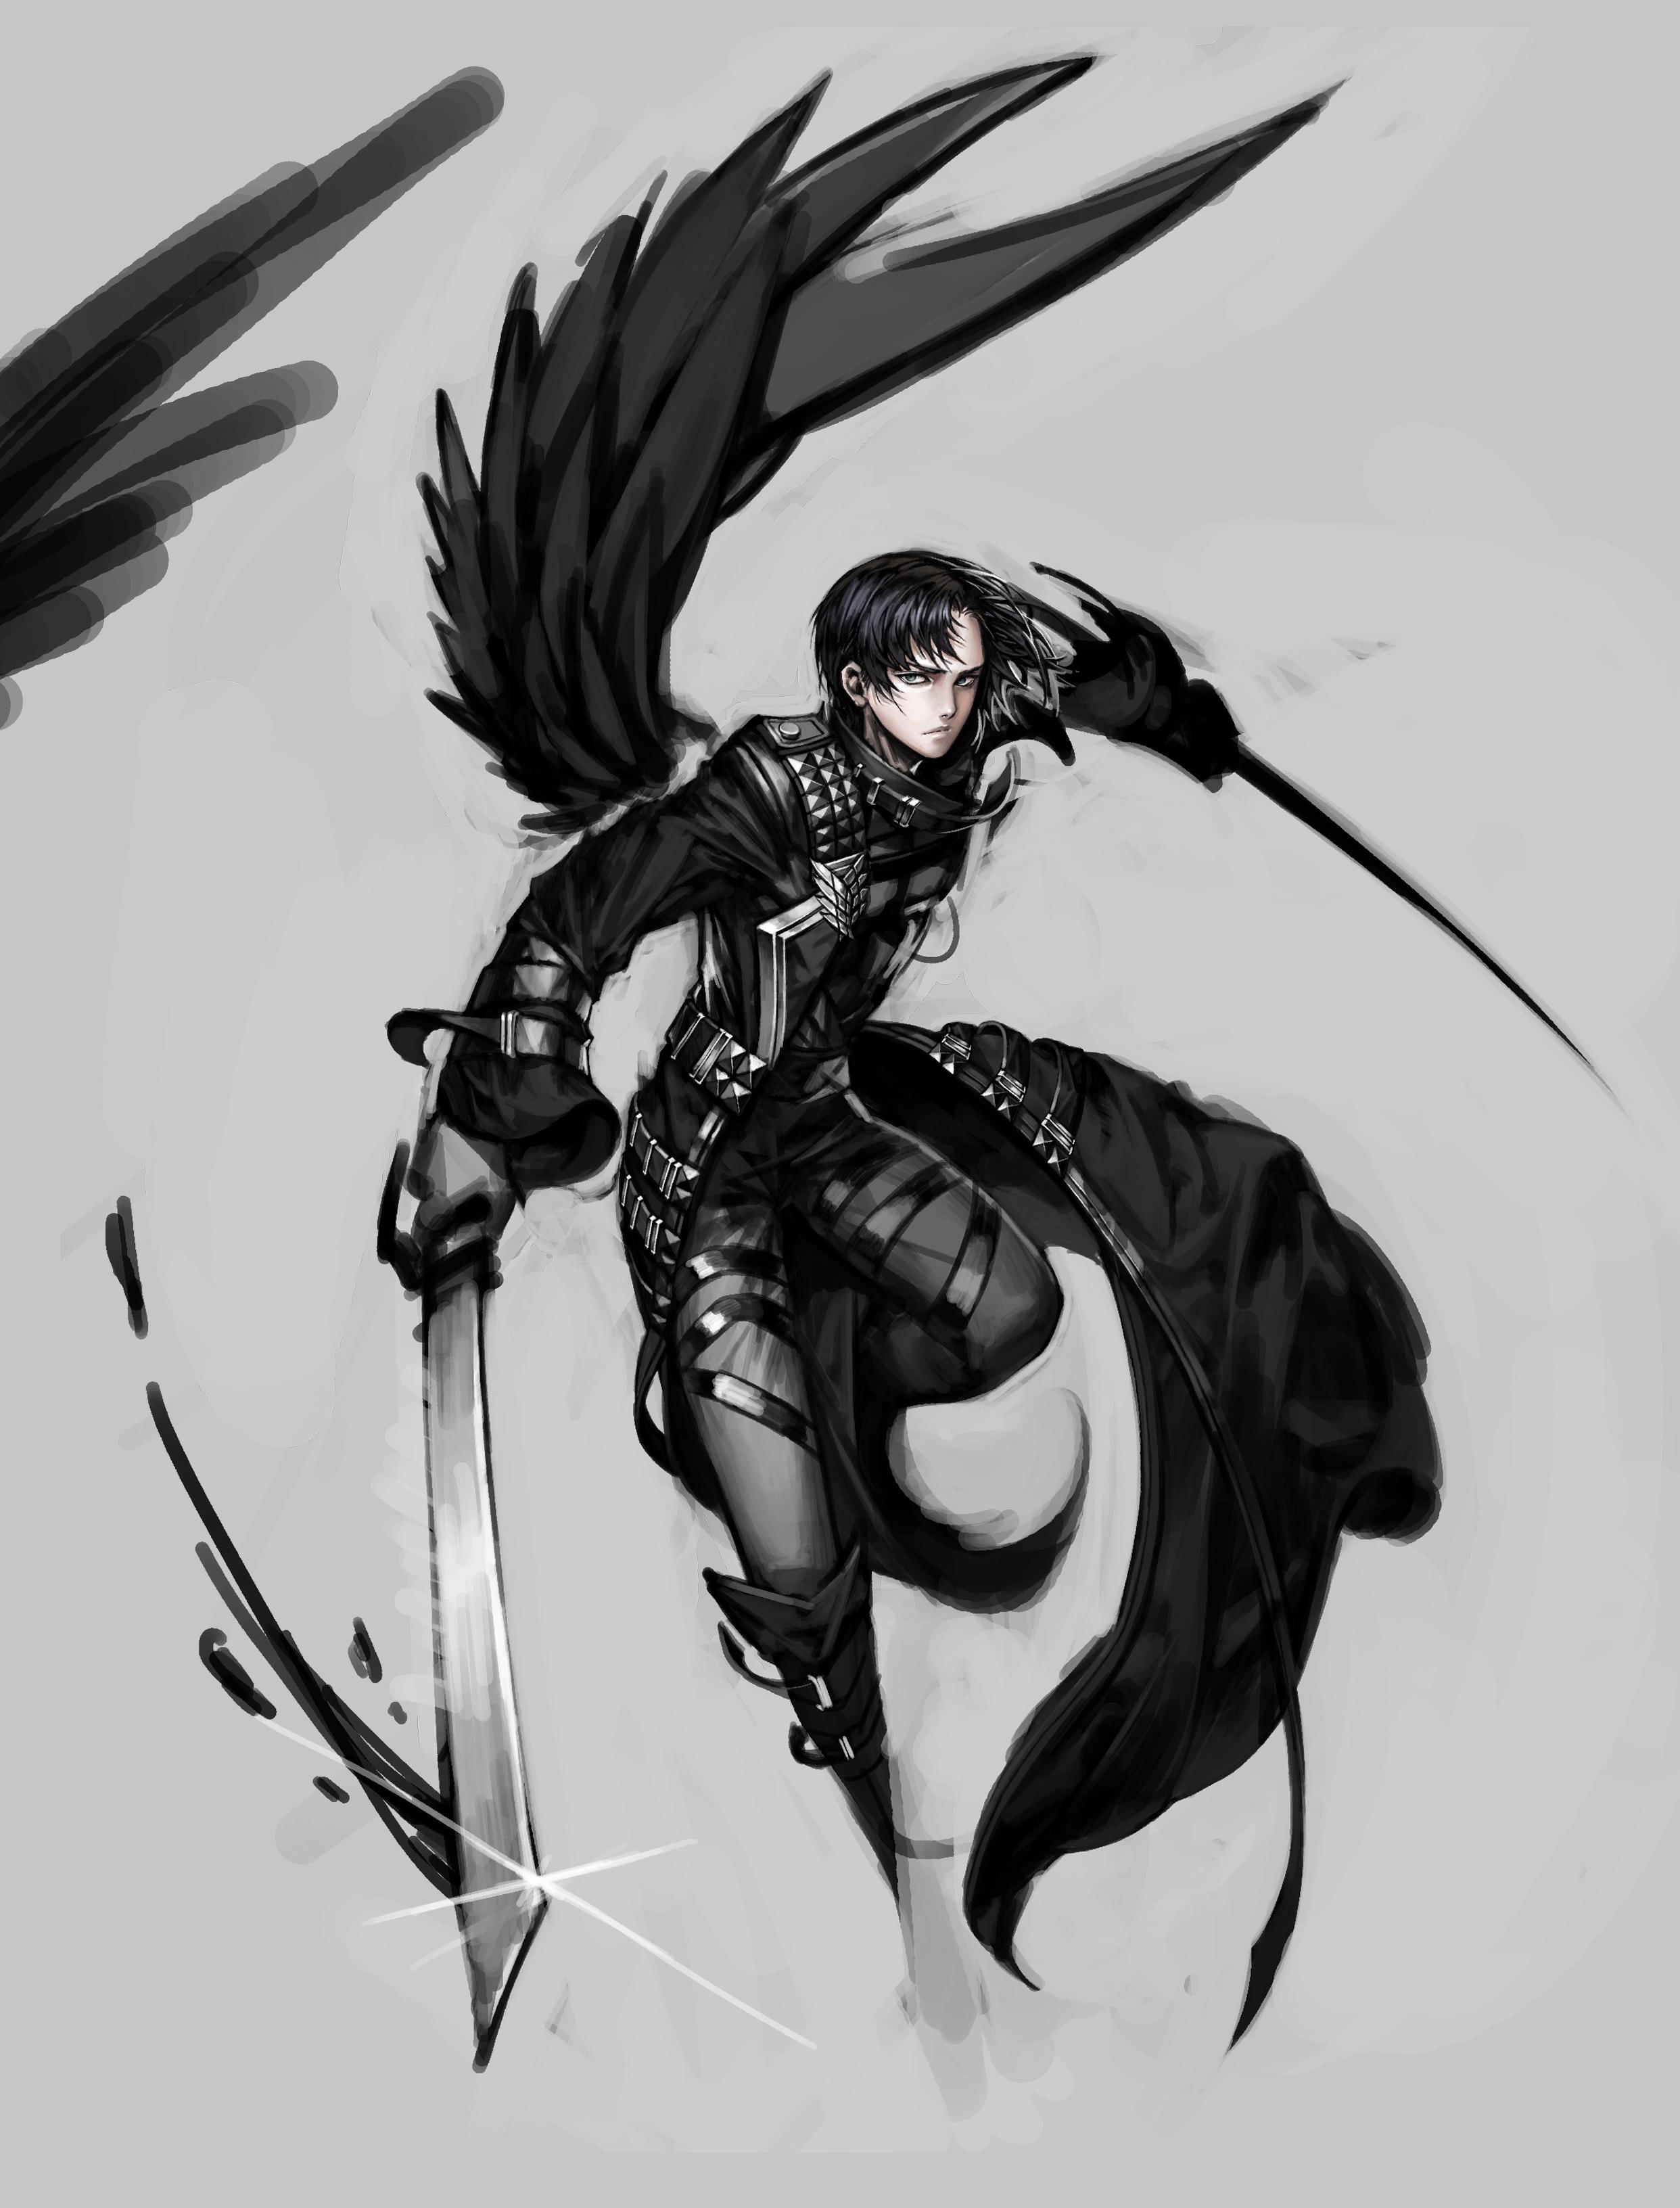 Anime Characters Use Dual Swords : Levi zerochan